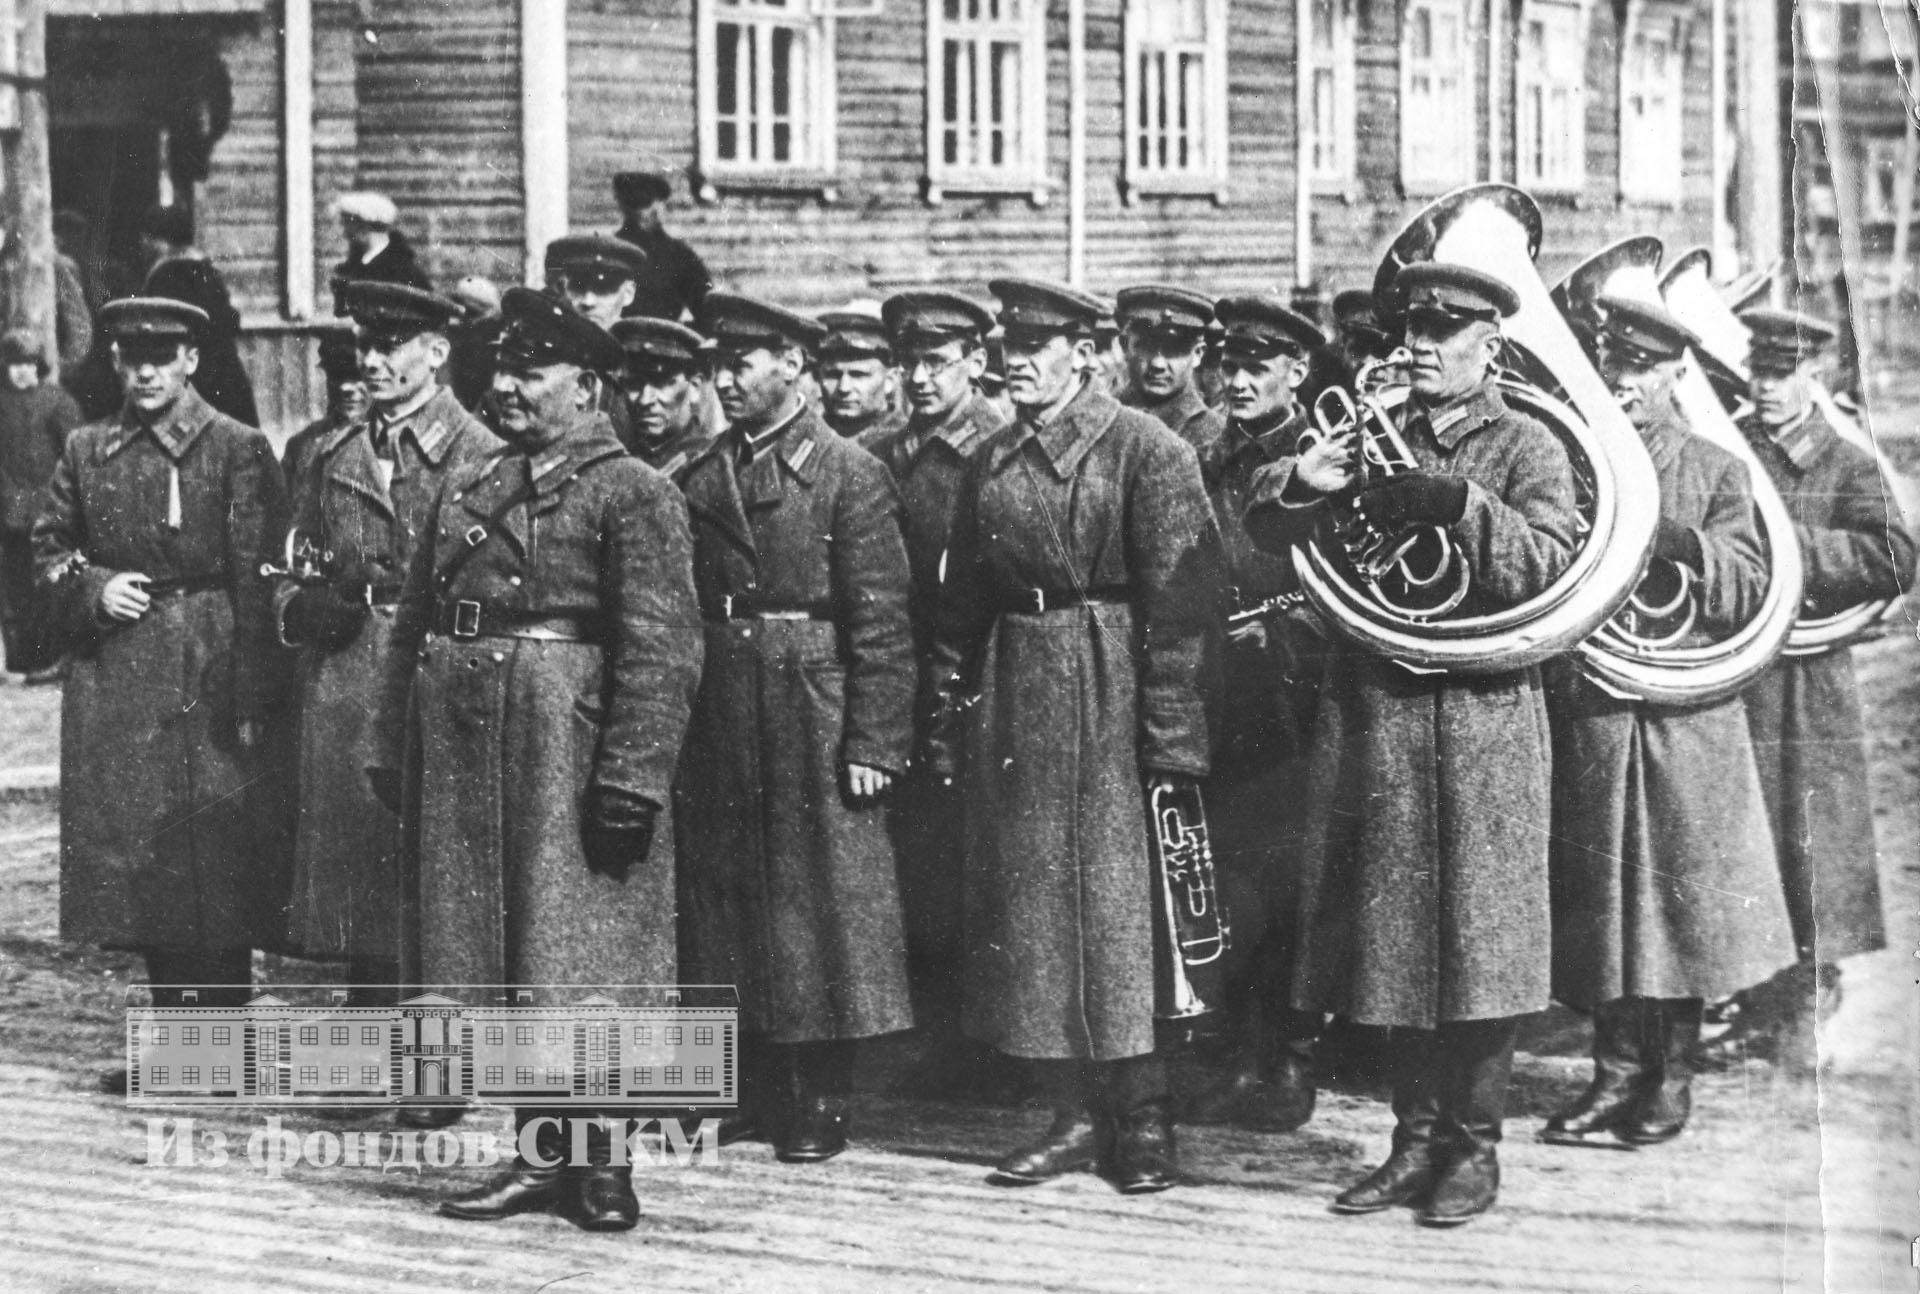 1941. Оркестр ВОХРа перед началом парада. 1 мая